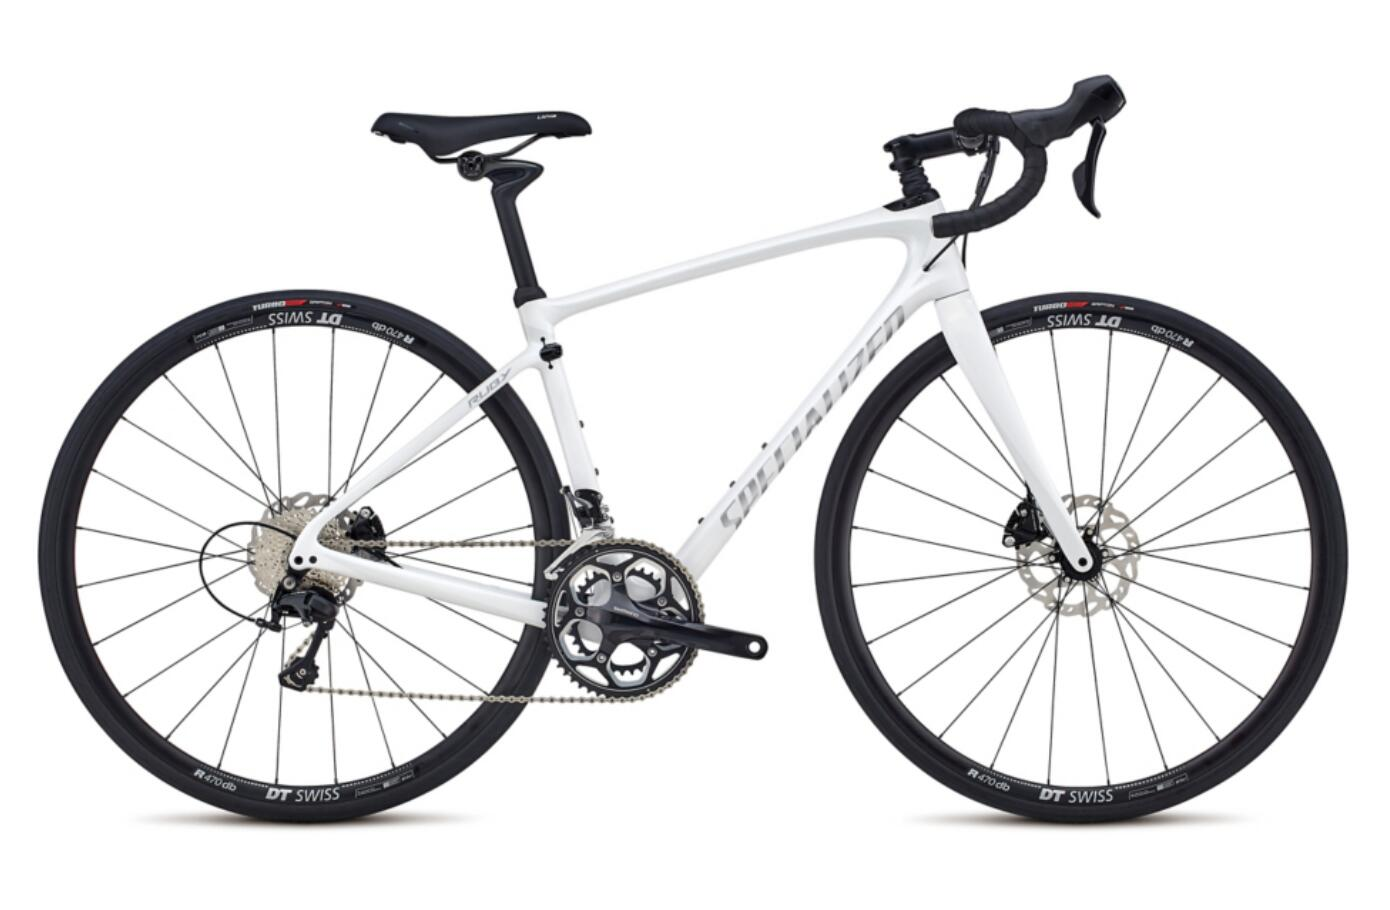 1eef8c75f6a 2018 Ruby Elite Carbon Road Bike